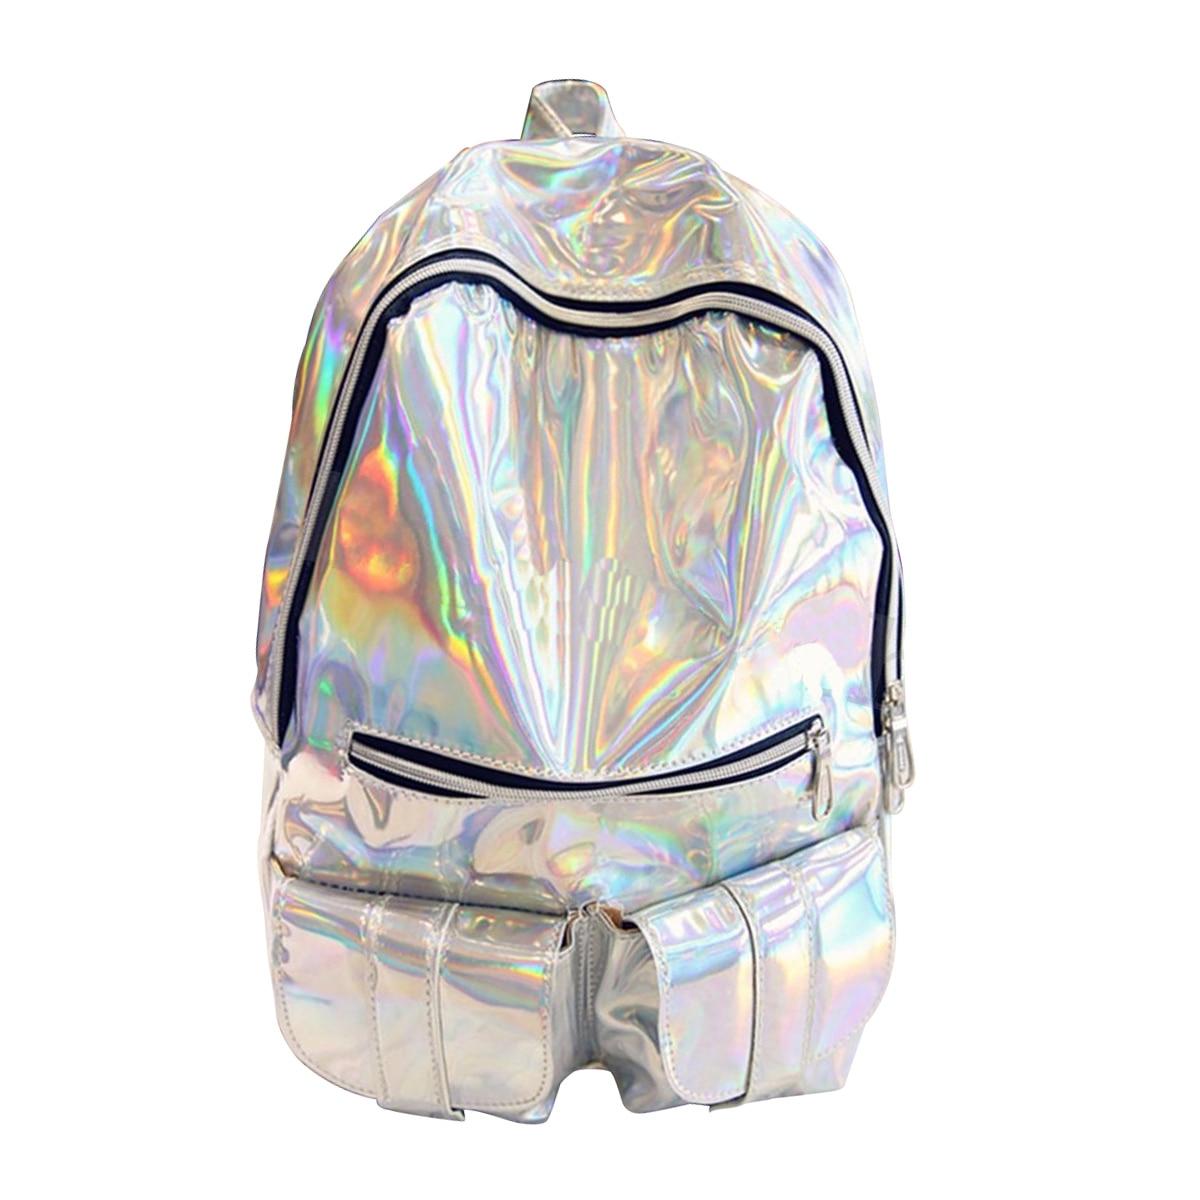 Hot Fashion Cool Women And Men Gammaray Hologram Backpack Shoulder Bag School Travel Bag Colors Lacer Purple Silver Gold